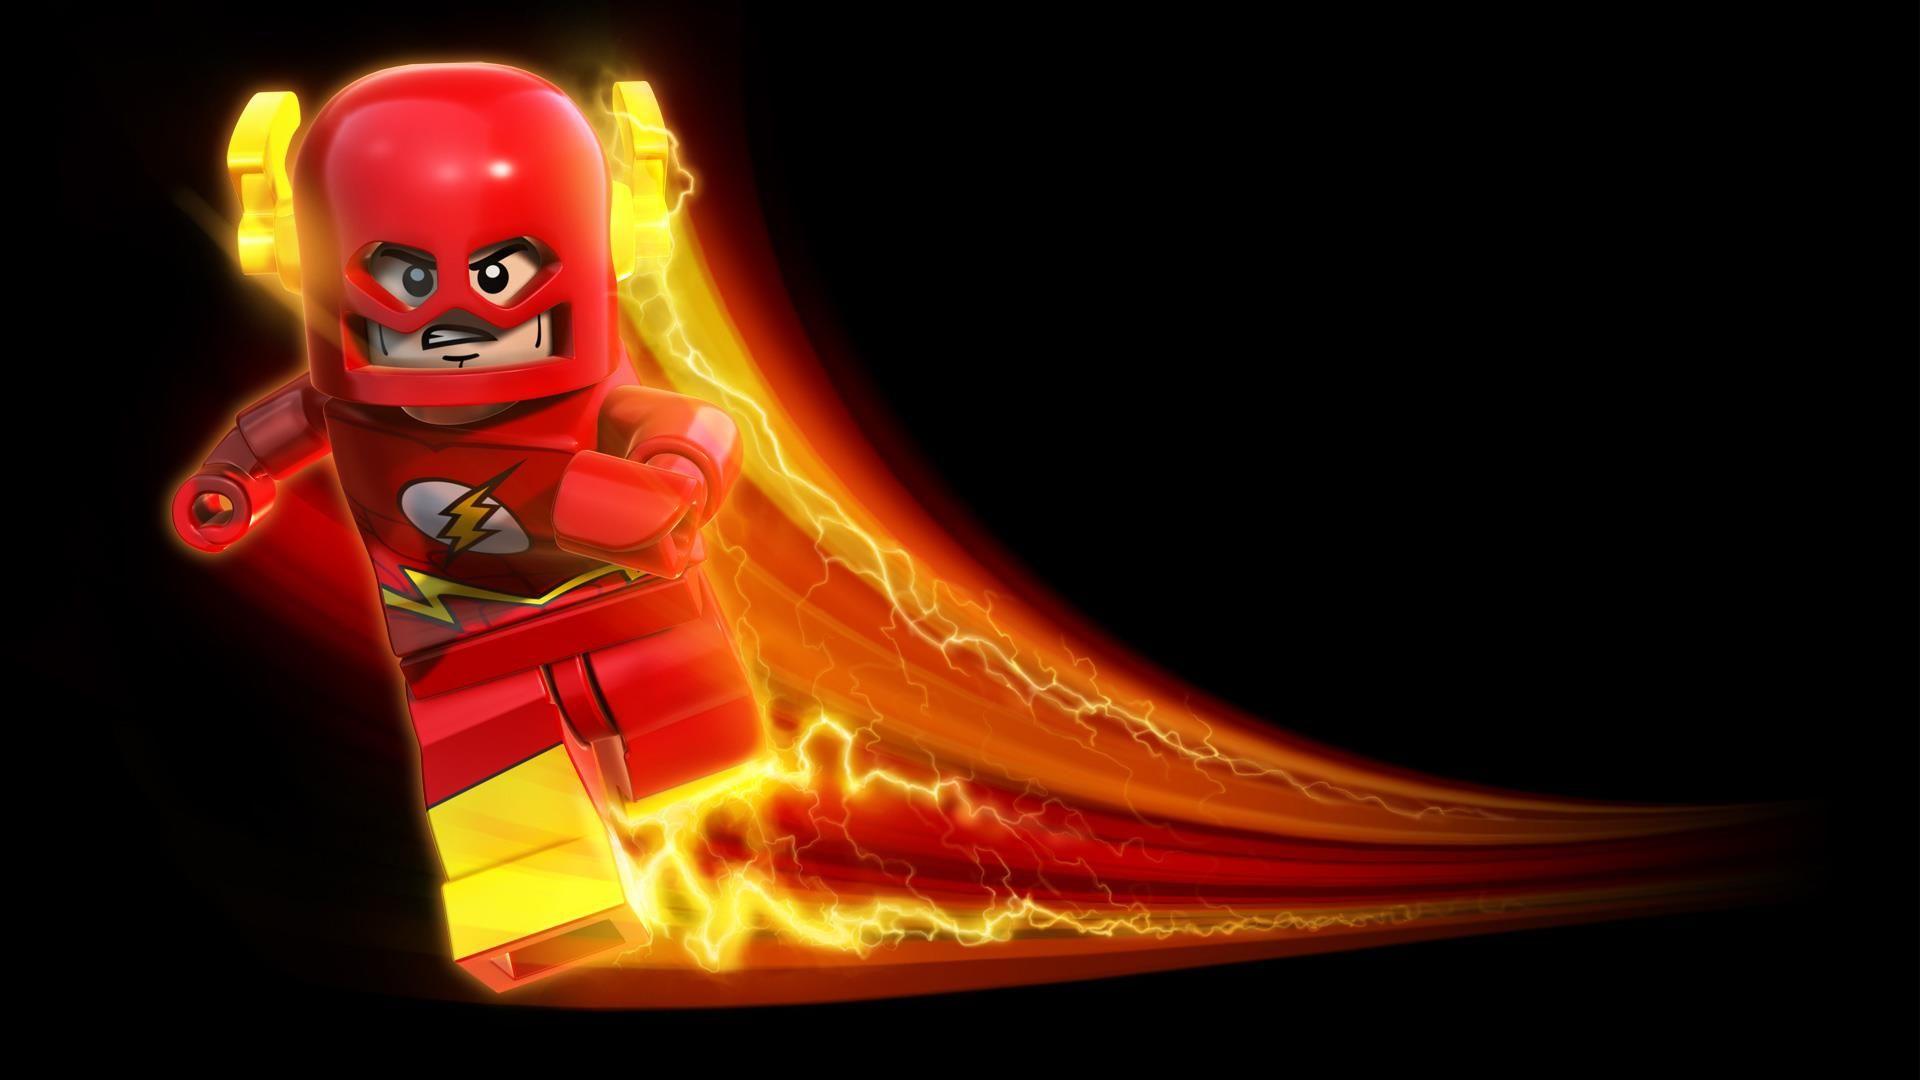 Lego Flash Running Wallpaper Hd Wall Desktop Dengan Gambar